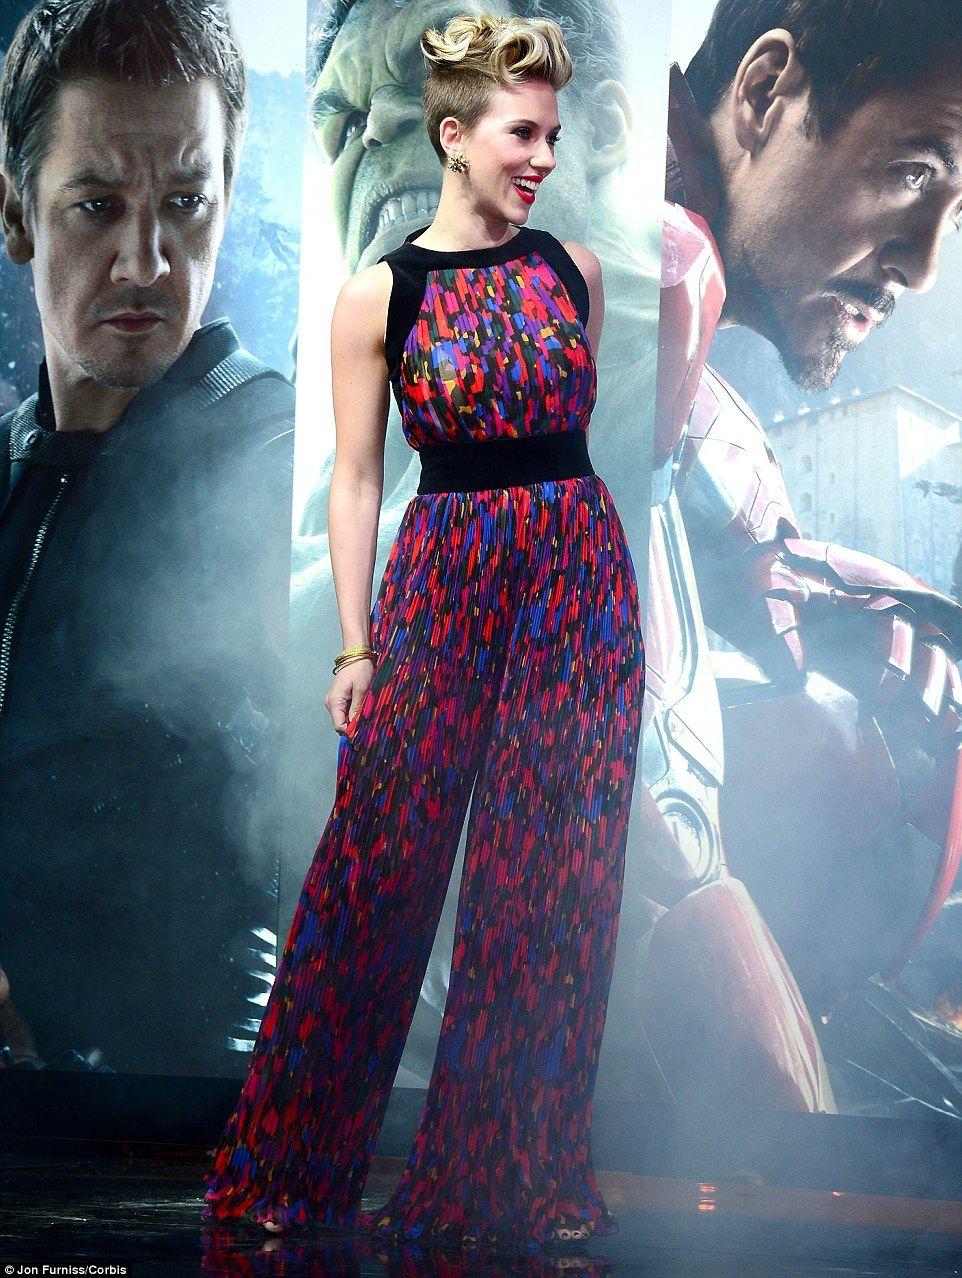 Scarlett Johansson stuns at UK premiere of Avengers: Age Of Ultron